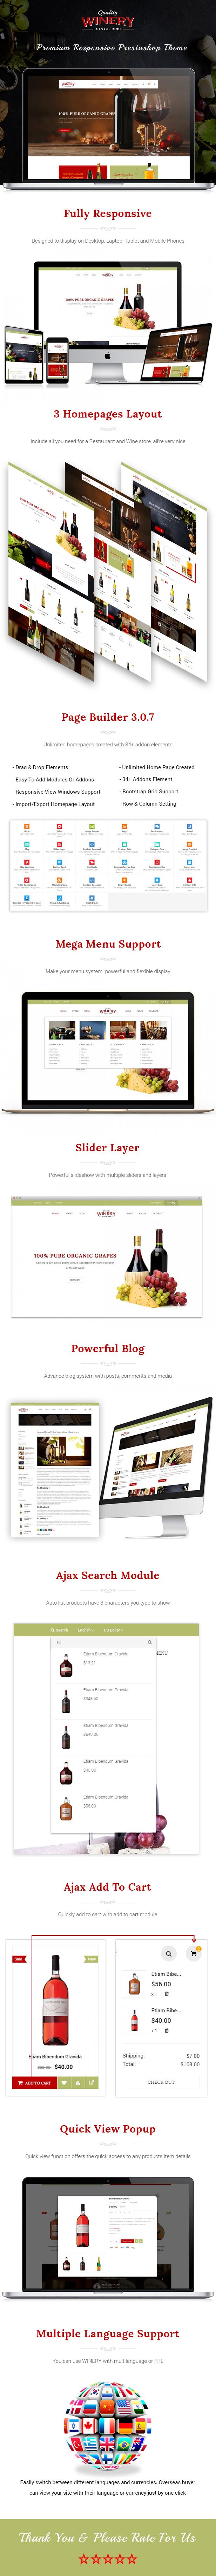 JMS Winery